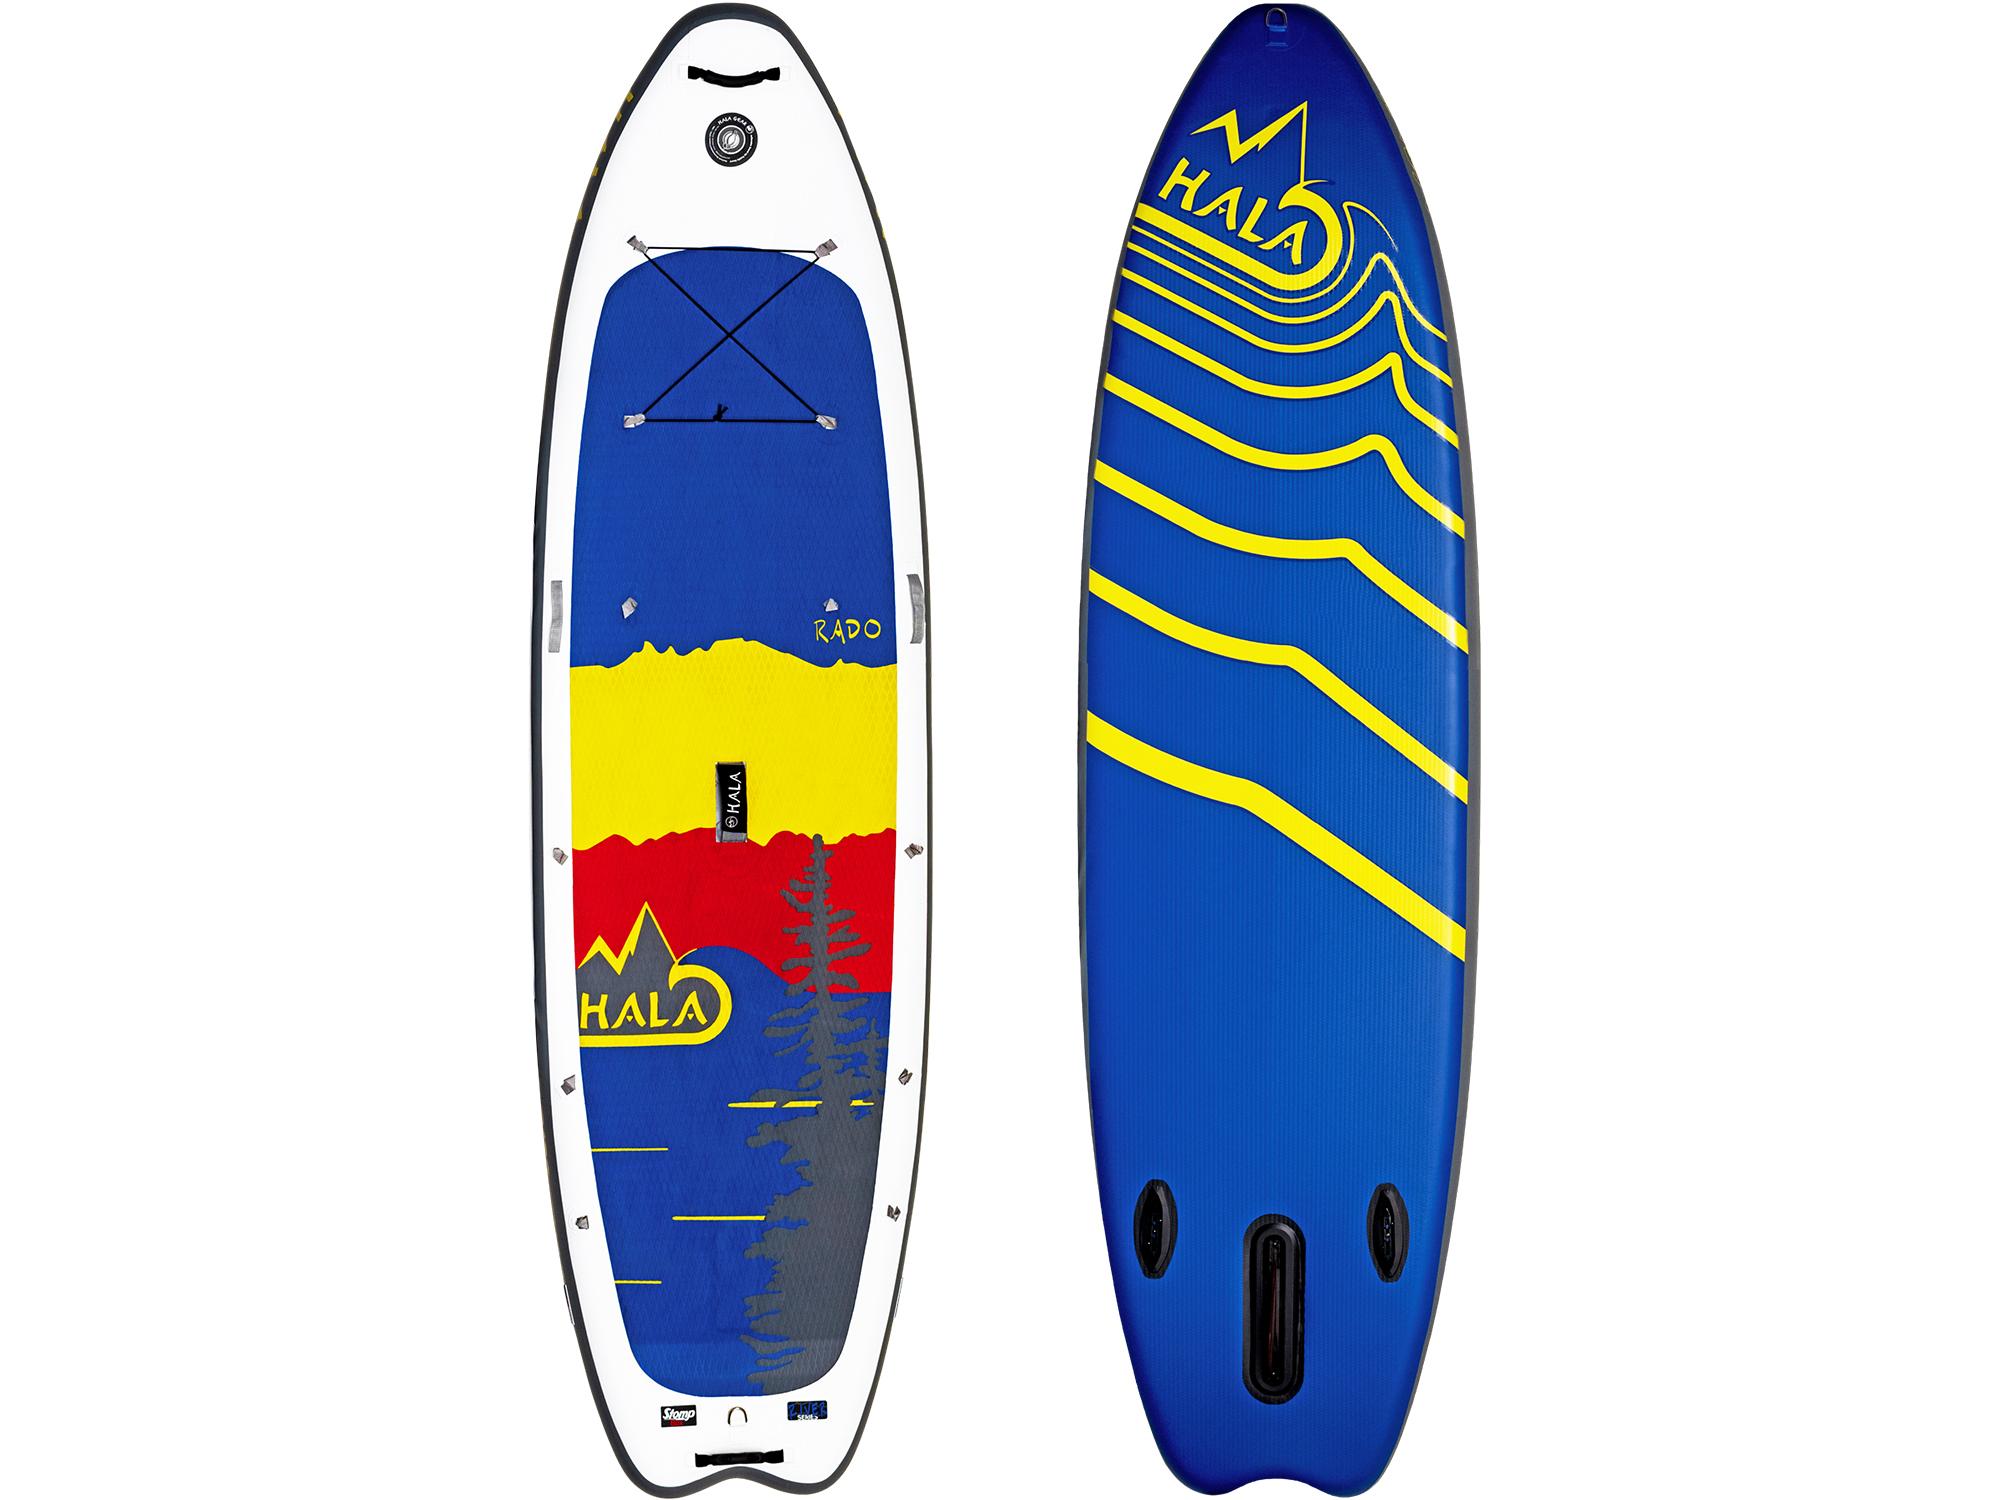 Hala Gear Hala Rado paddleboard